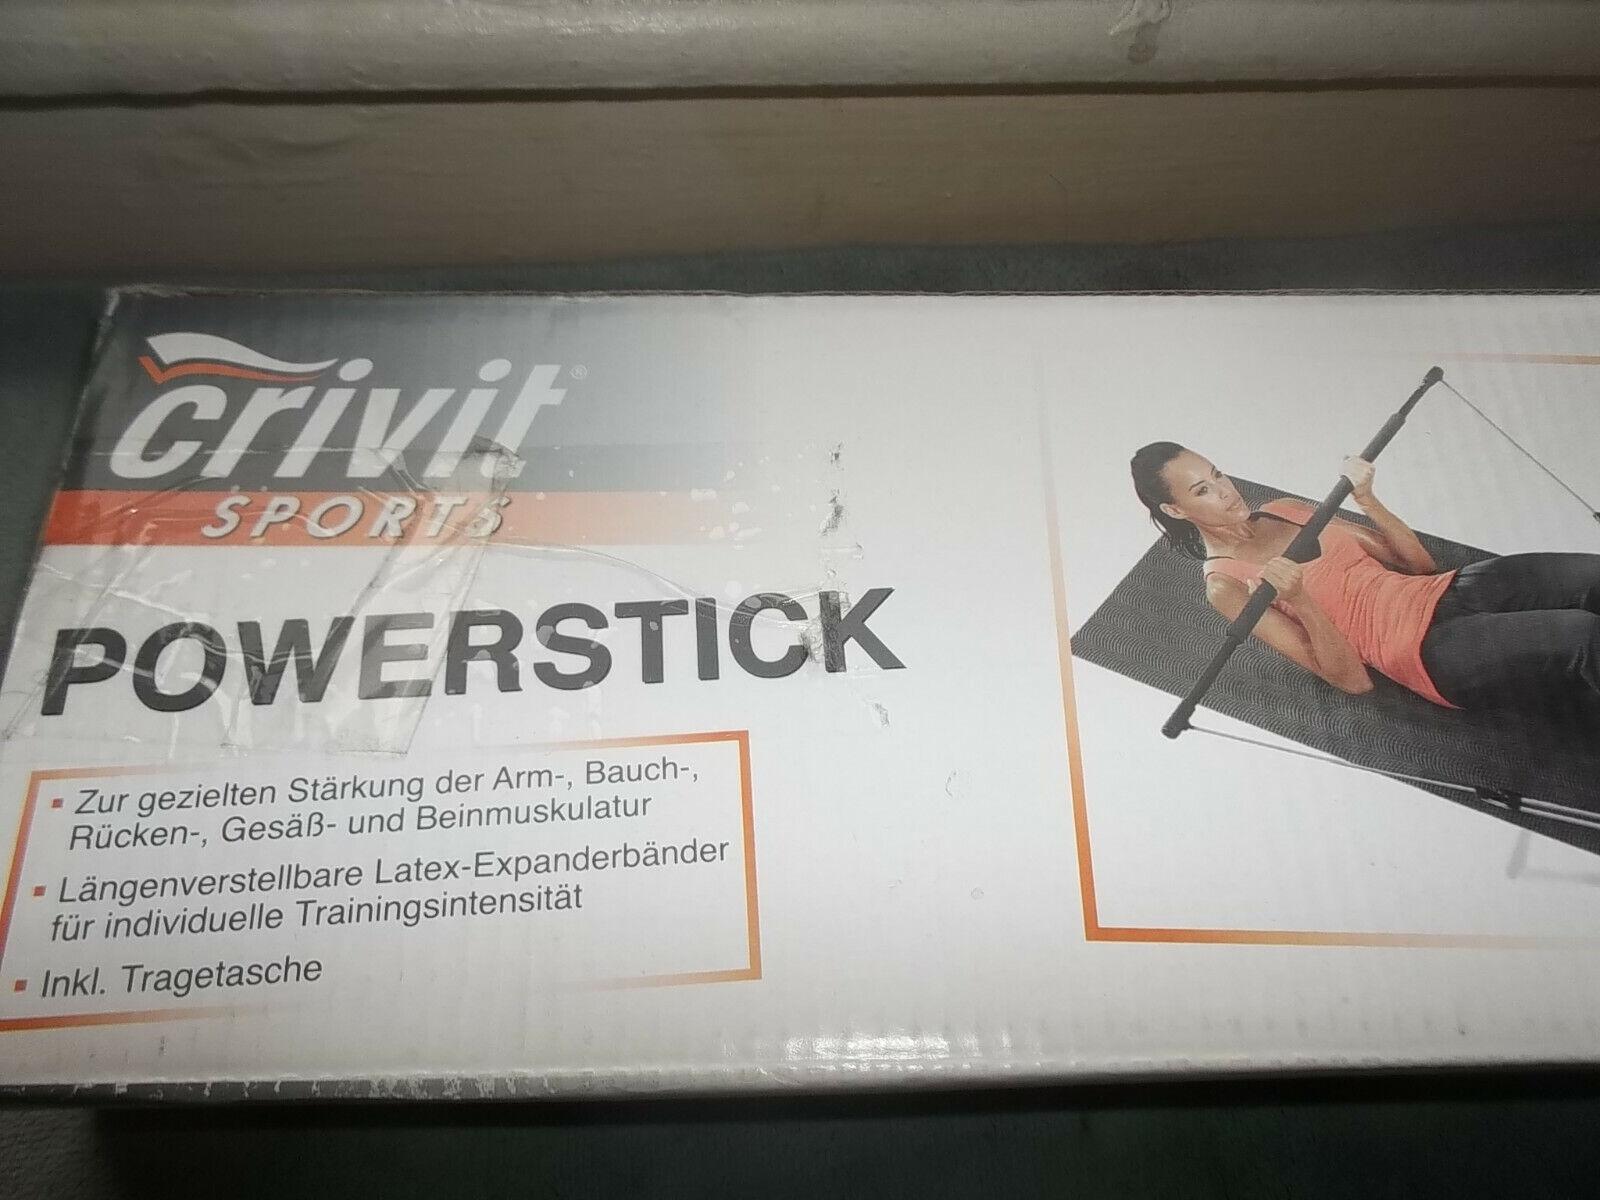 CRIVIT Powerstick Fitnesstrainer Armtrainer Potrainer Rückentrainer inkl.DVD